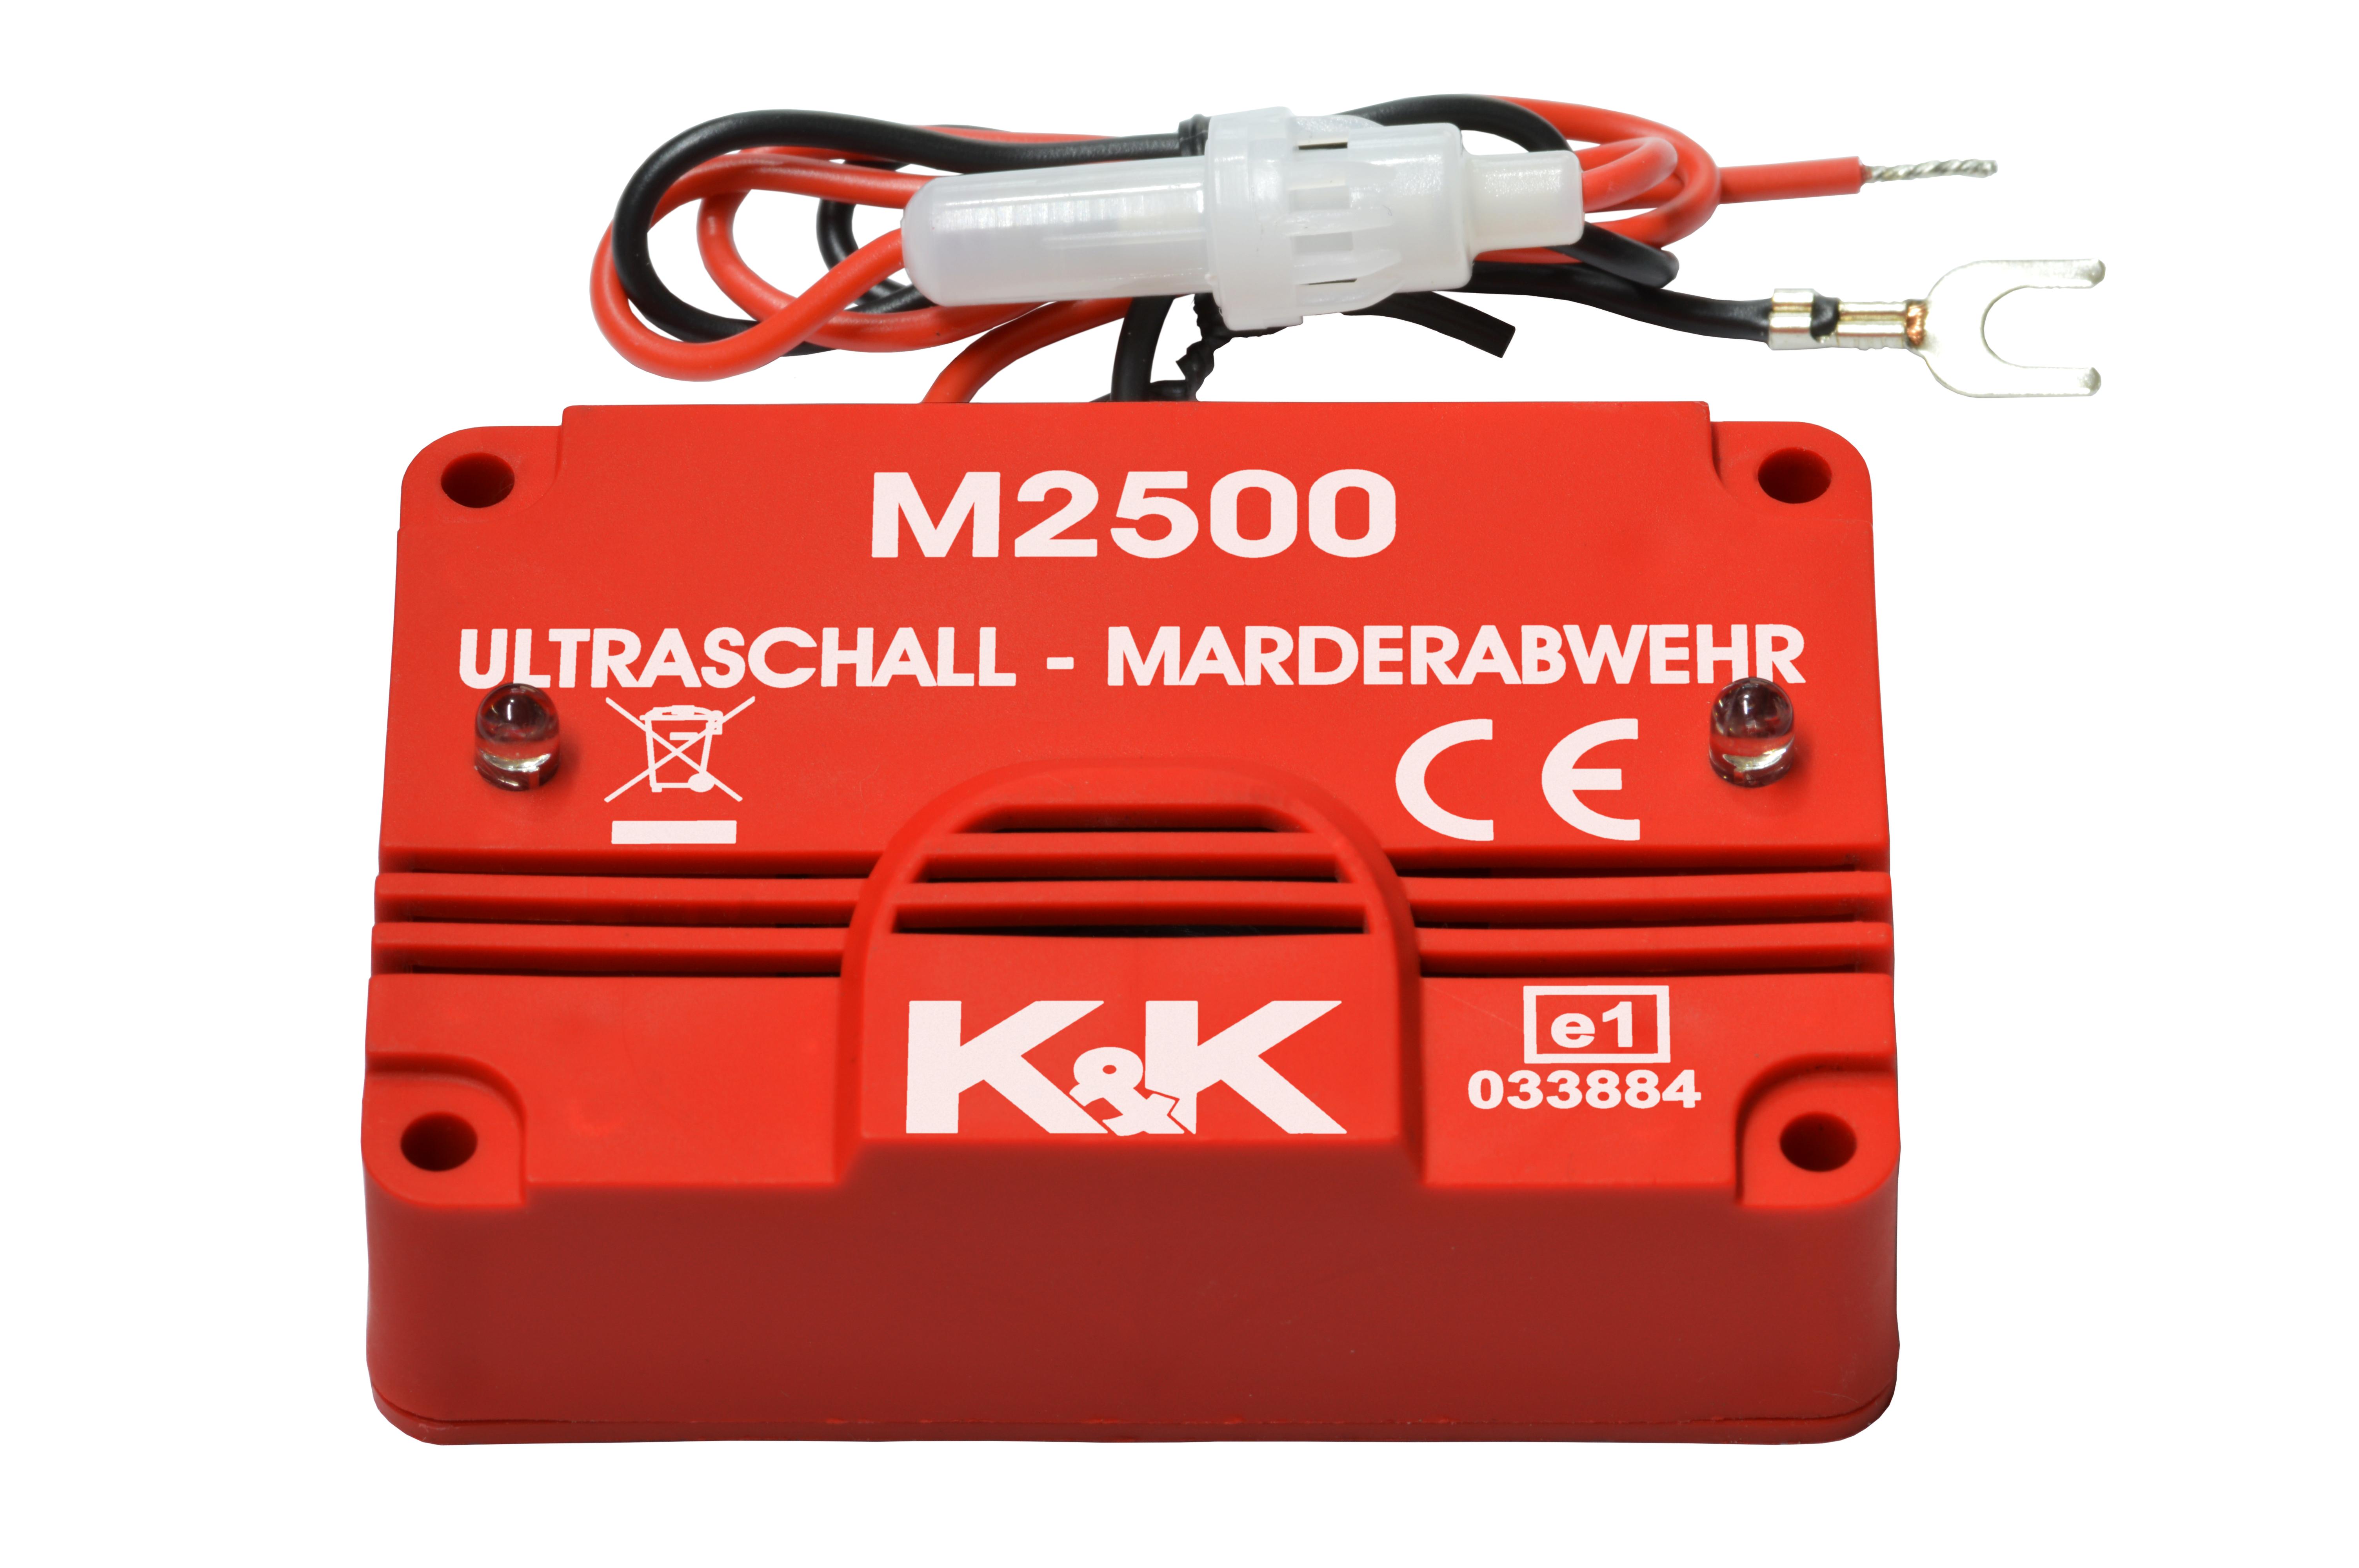 K&K Marderabwehrgerät M2500